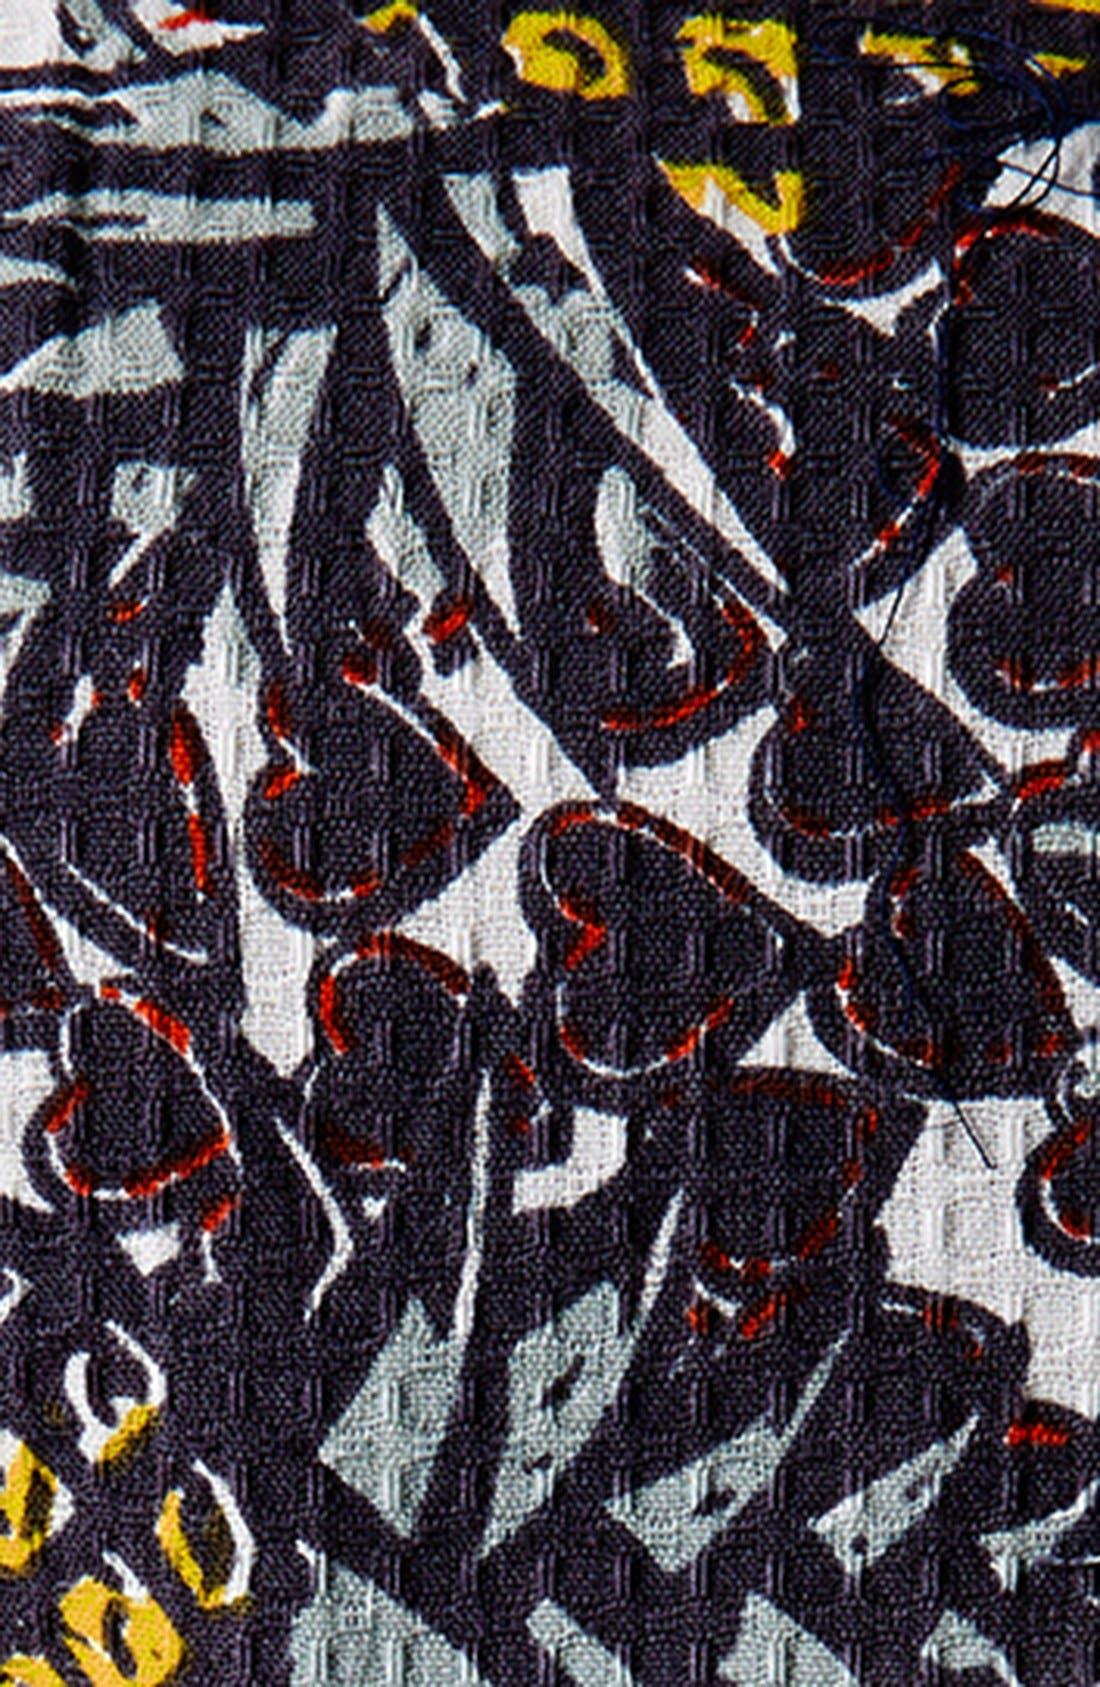 Pineapple Print Cutout Fit & Flare Dress,                             Alternate thumbnail 4, color,                             Yellow Multi